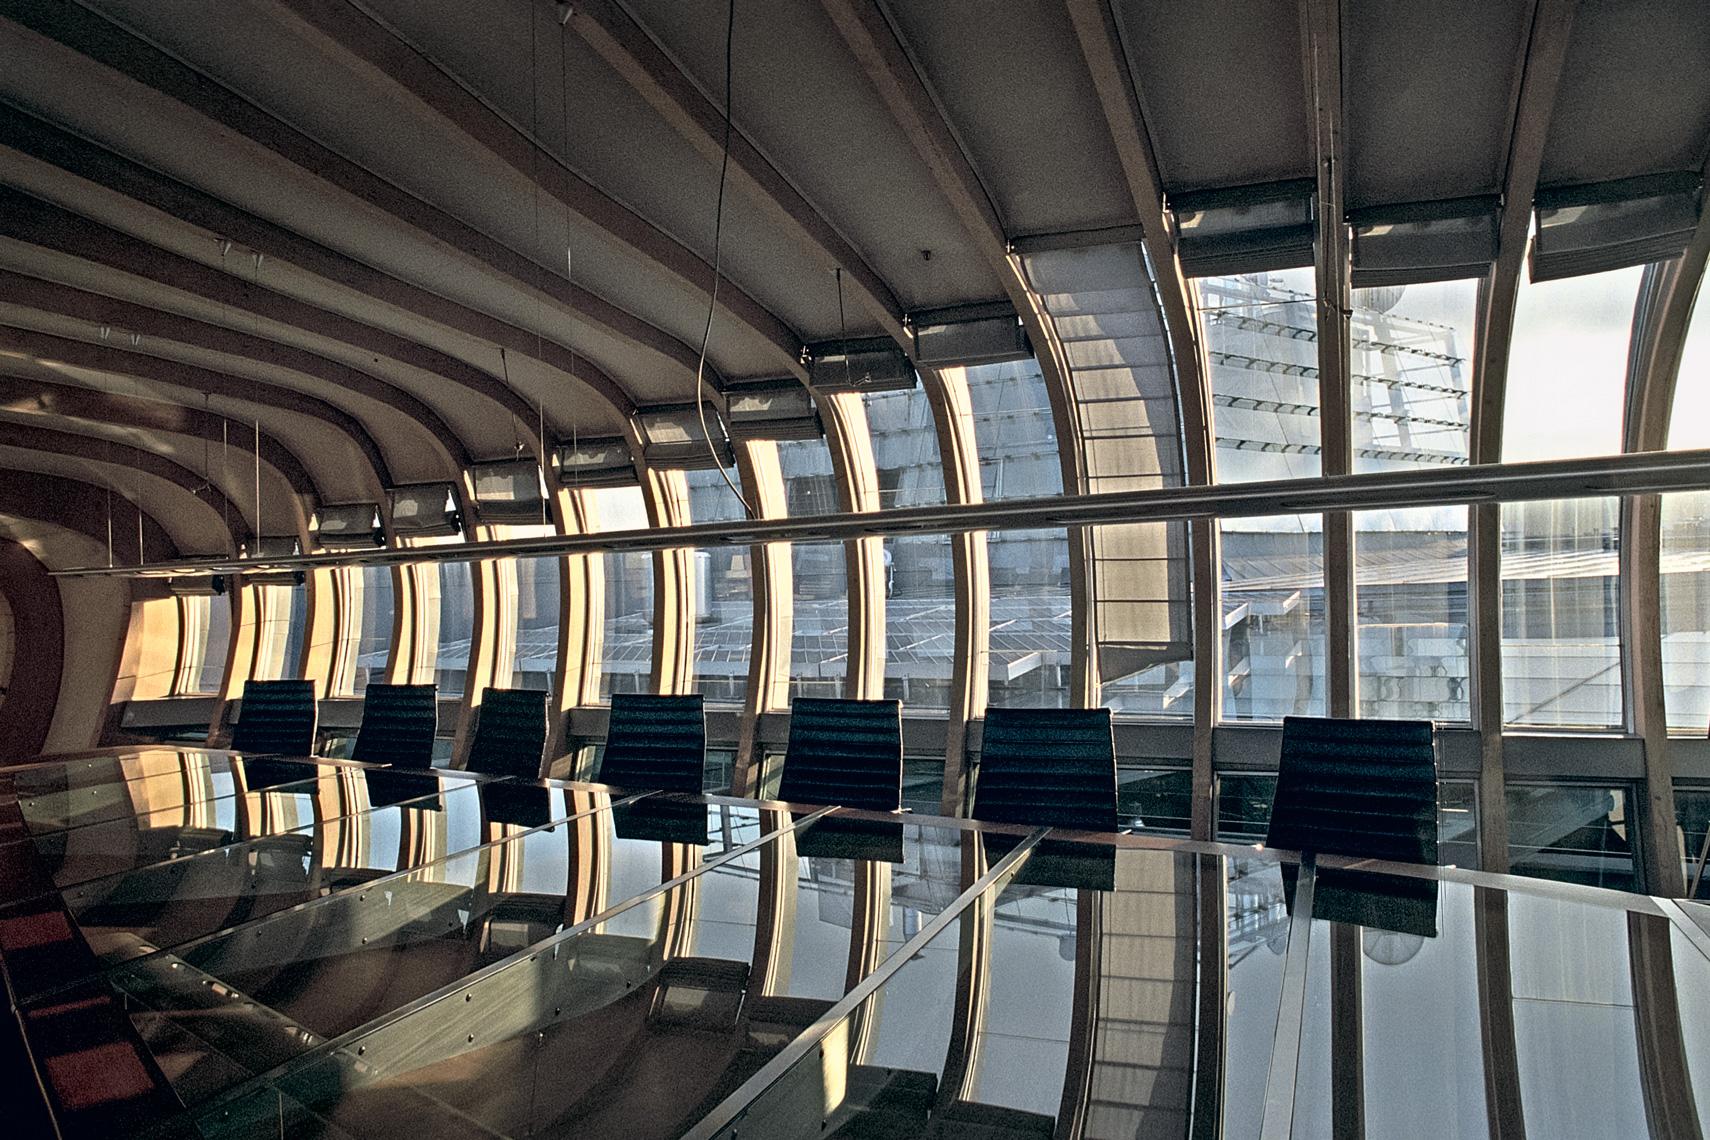 Architect Erick van Egeraat | Mike Harris Photography